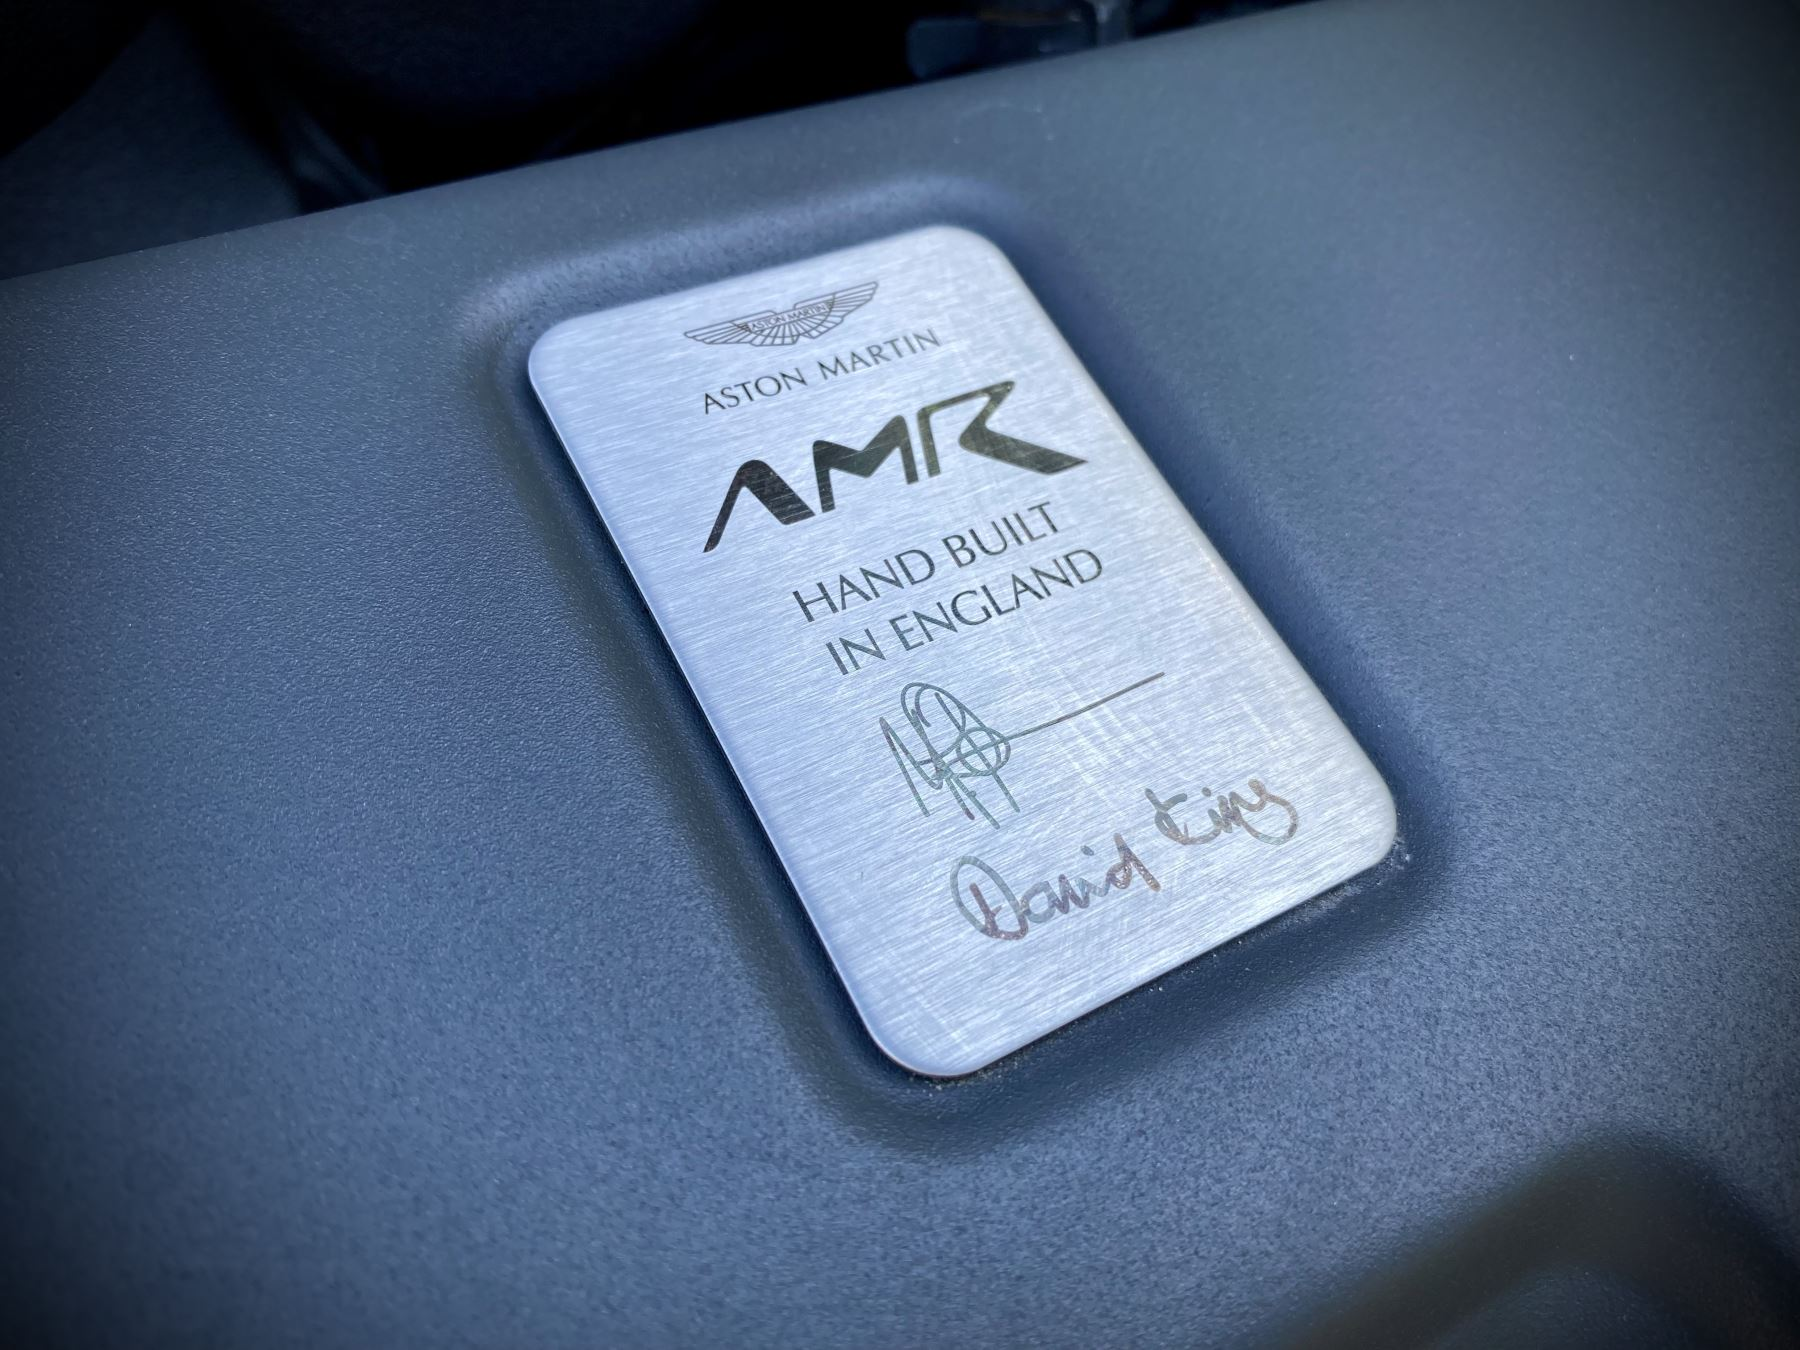 Aston Martin V12 Vantage AMR 6.0 V12 600BHP Manual 1 of 100.     1 Owner From New, Full Aston Martin History. image 17